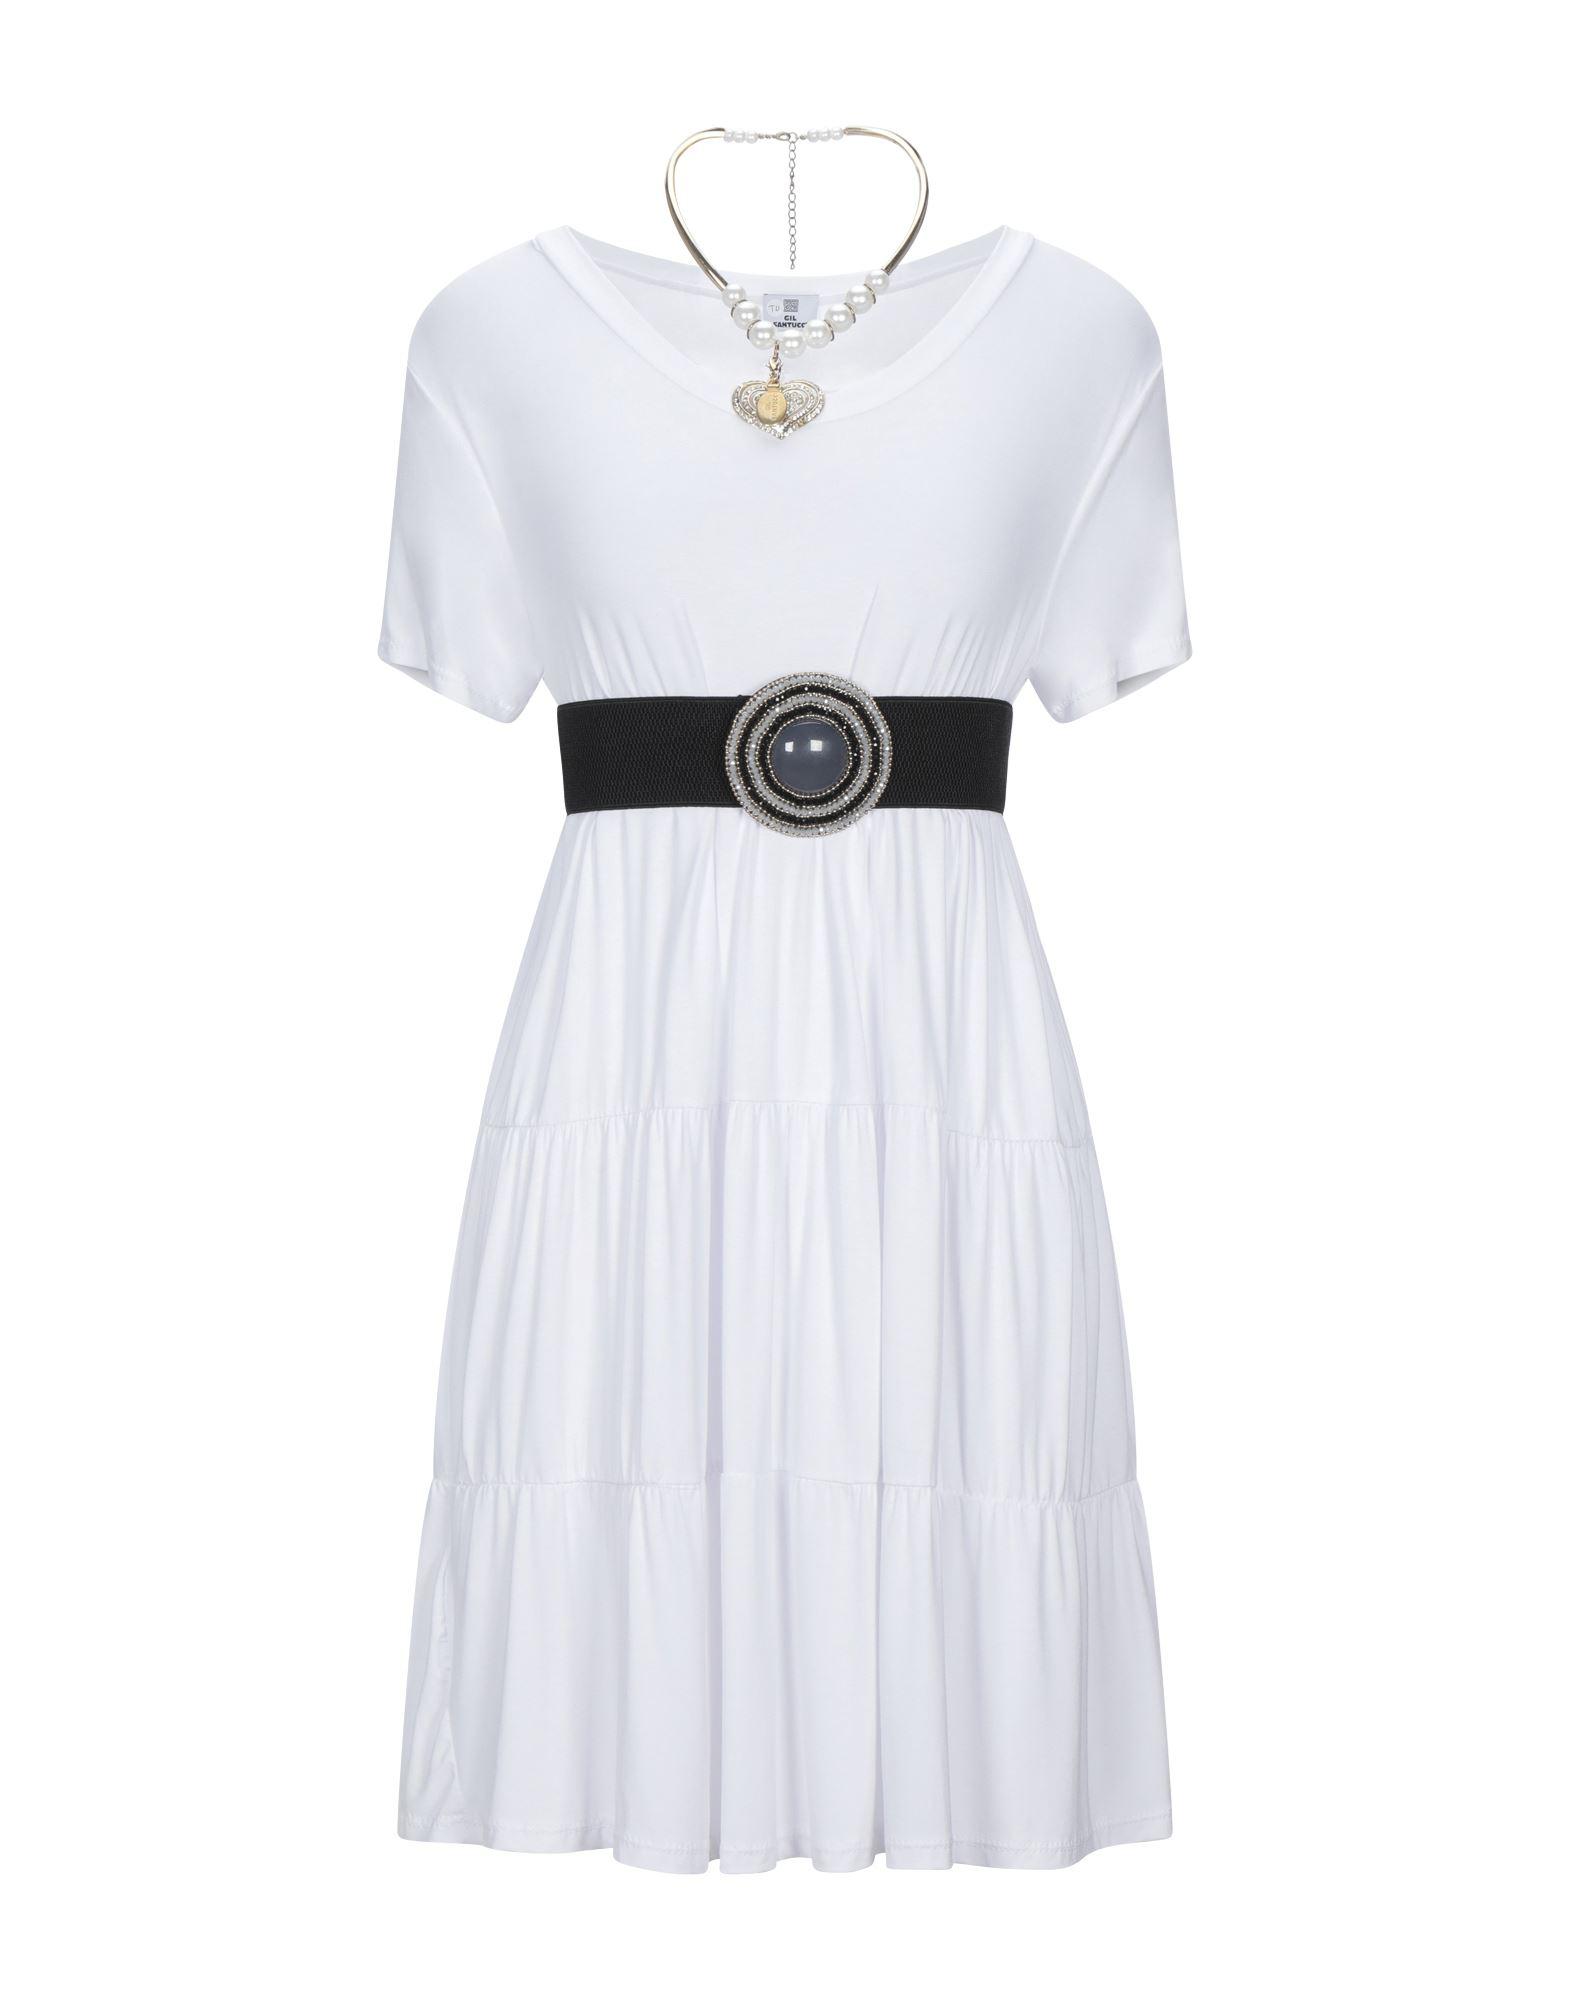 Фото - GIL SANTUCCI Короткое платье gil santucci платье до колена